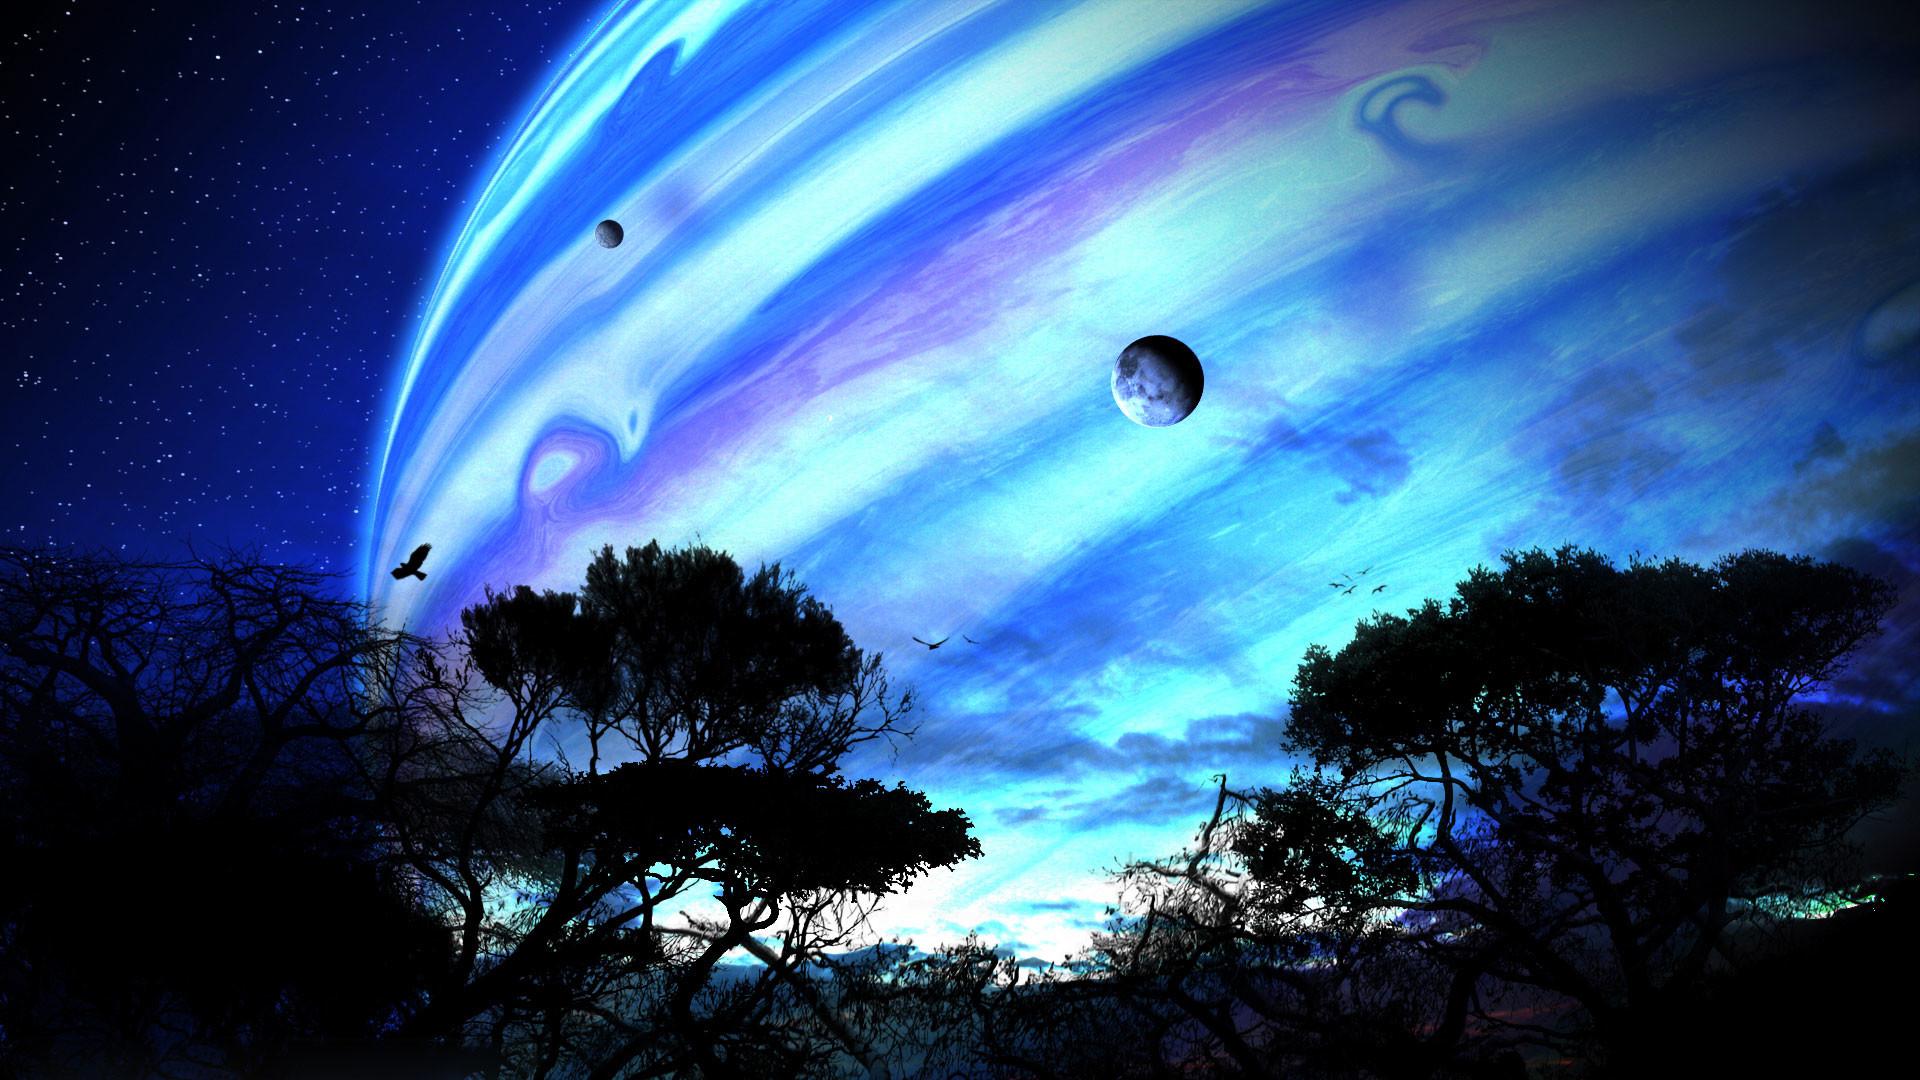 hd pics photos space pandora avatar planet desktop background wallpaper